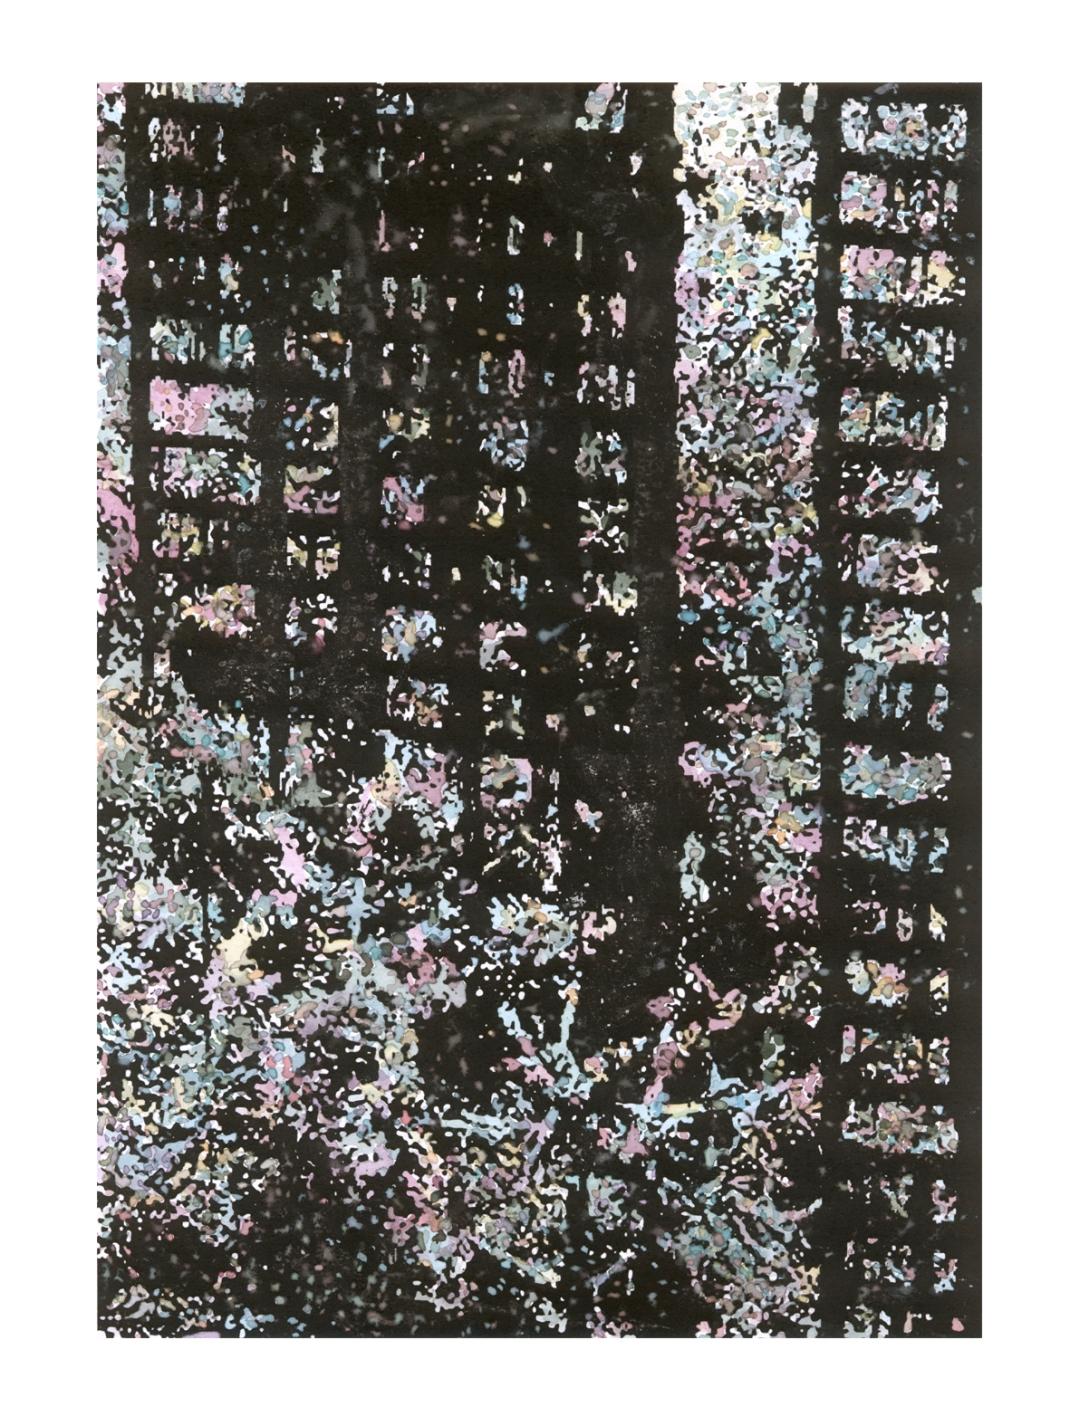 asbjorn-skou-lichen-algorithm